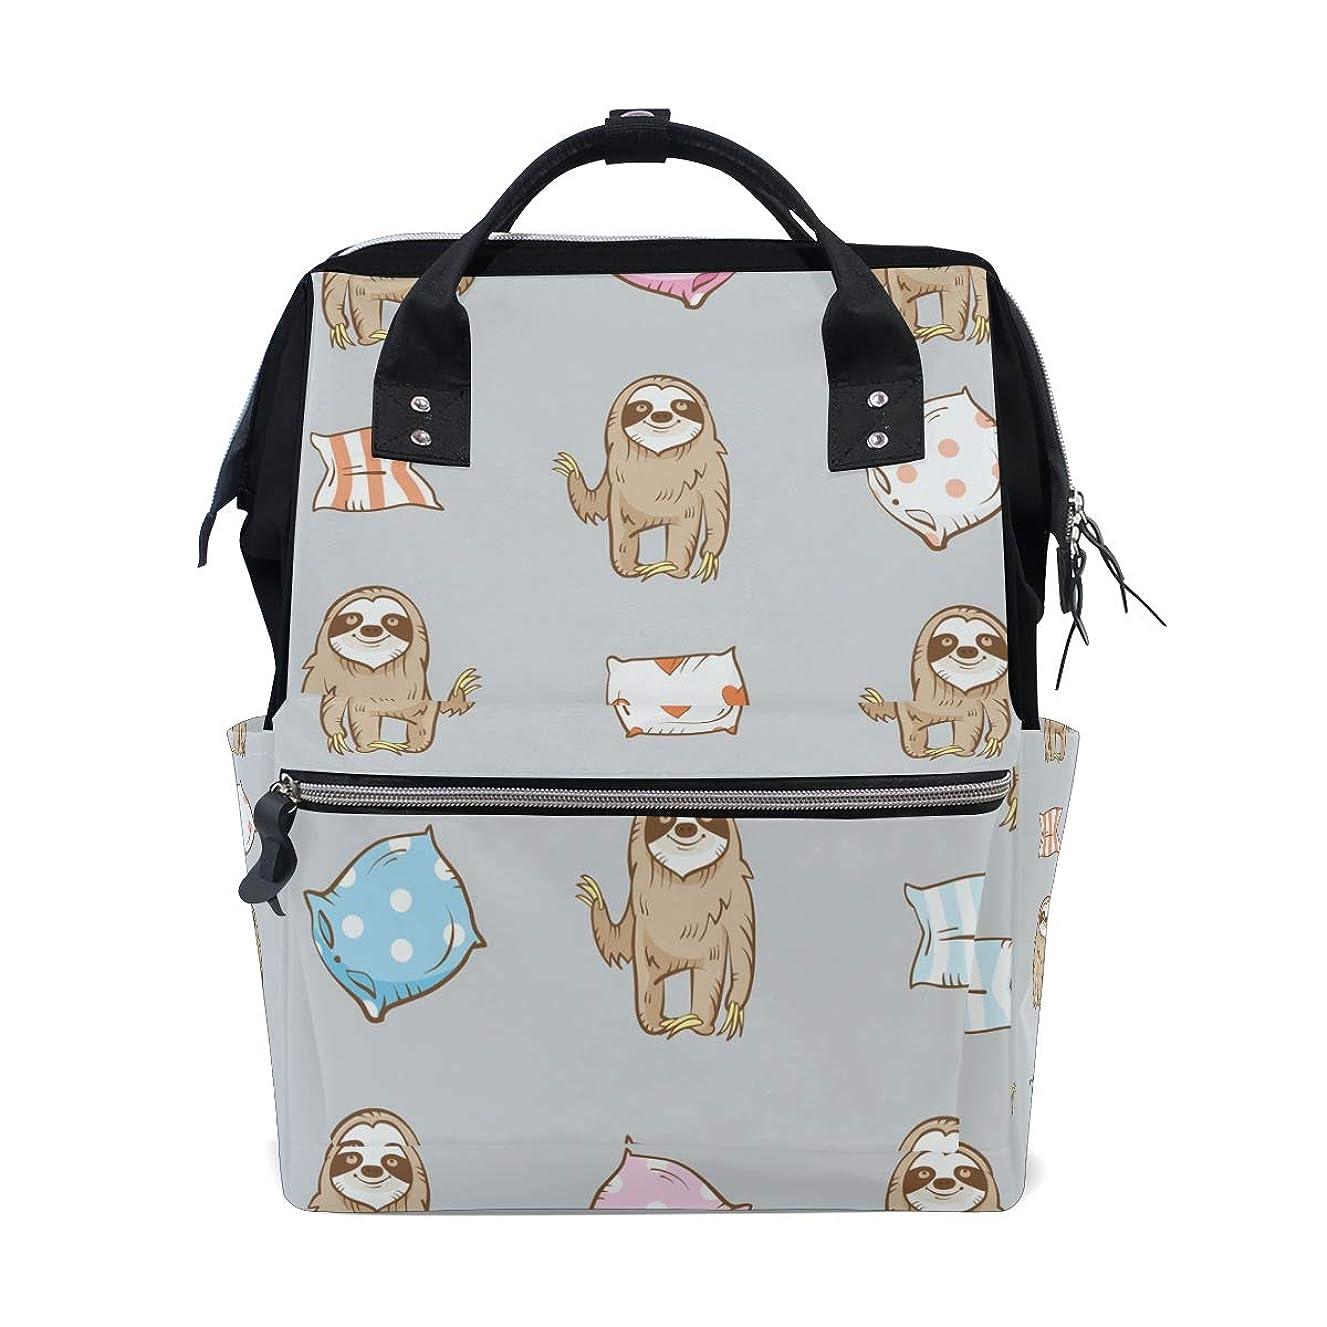 Sloth Cats School Backpack Large Capacity Mummy Bags Laptop Handbag Casual Travel Rucksack Satchel For Women Men Adult Teen Children